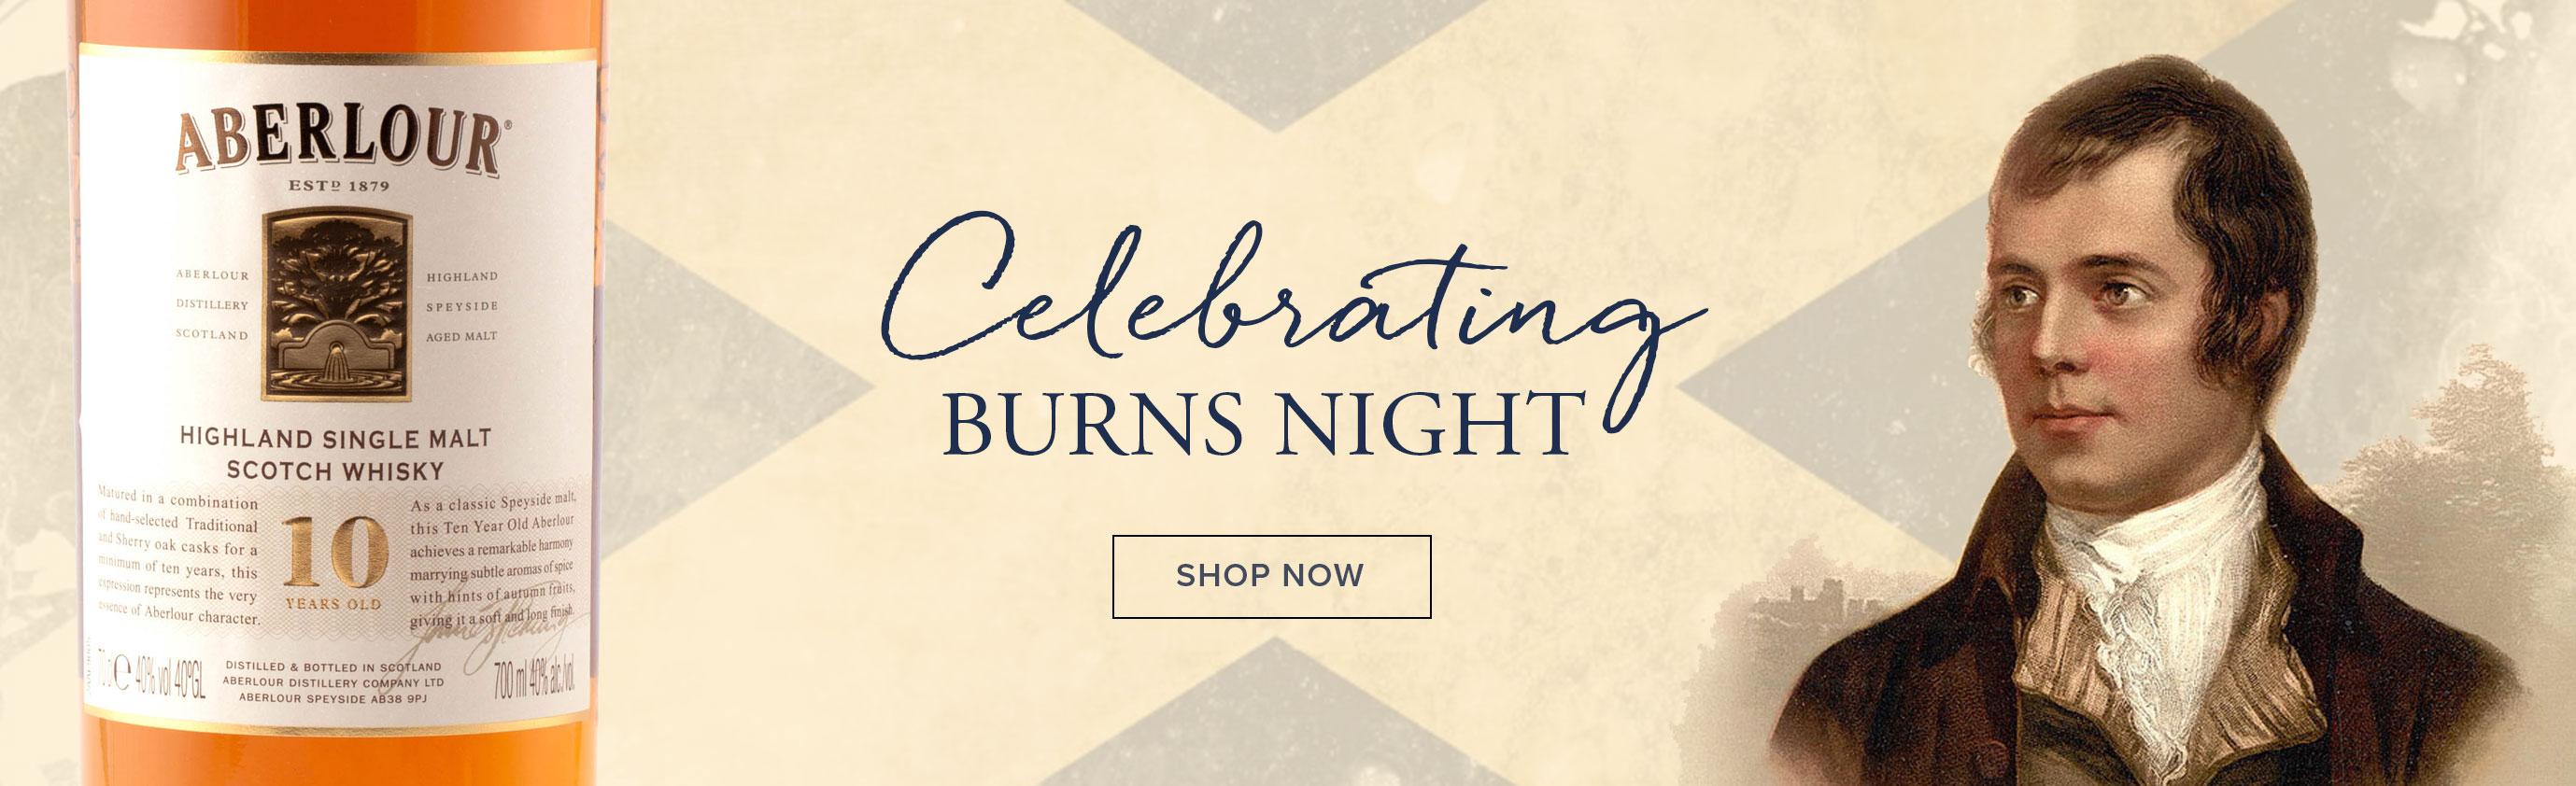 Celebrating Burns Night Scottish Whisky